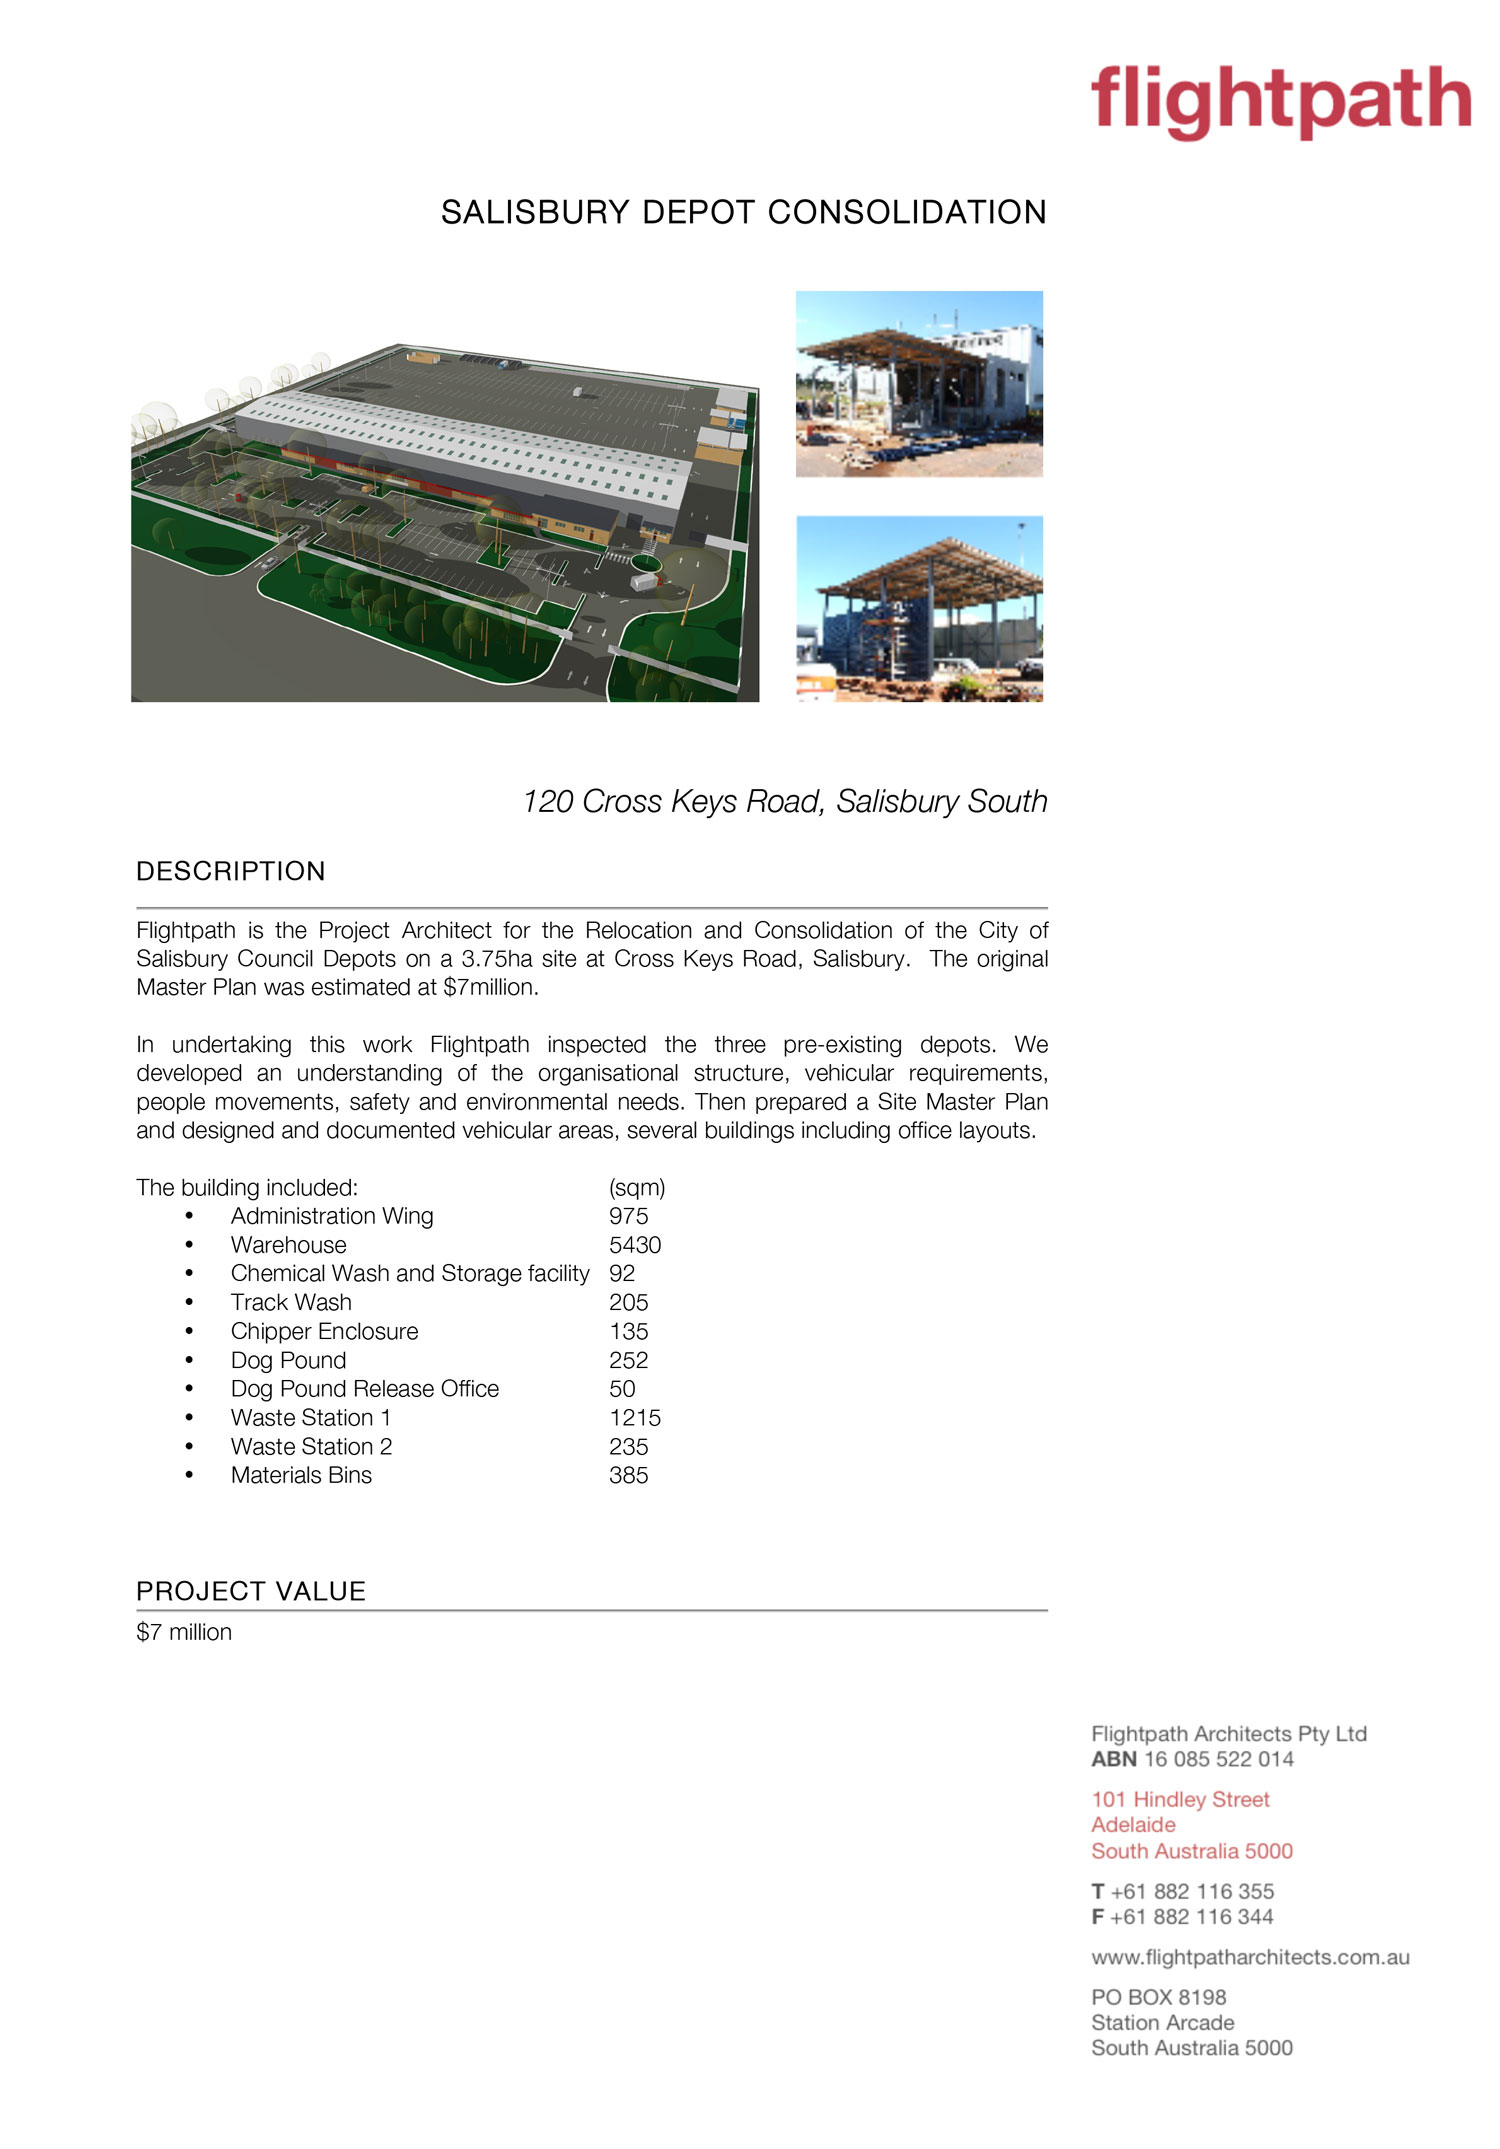 2013 - Salisbury Depot